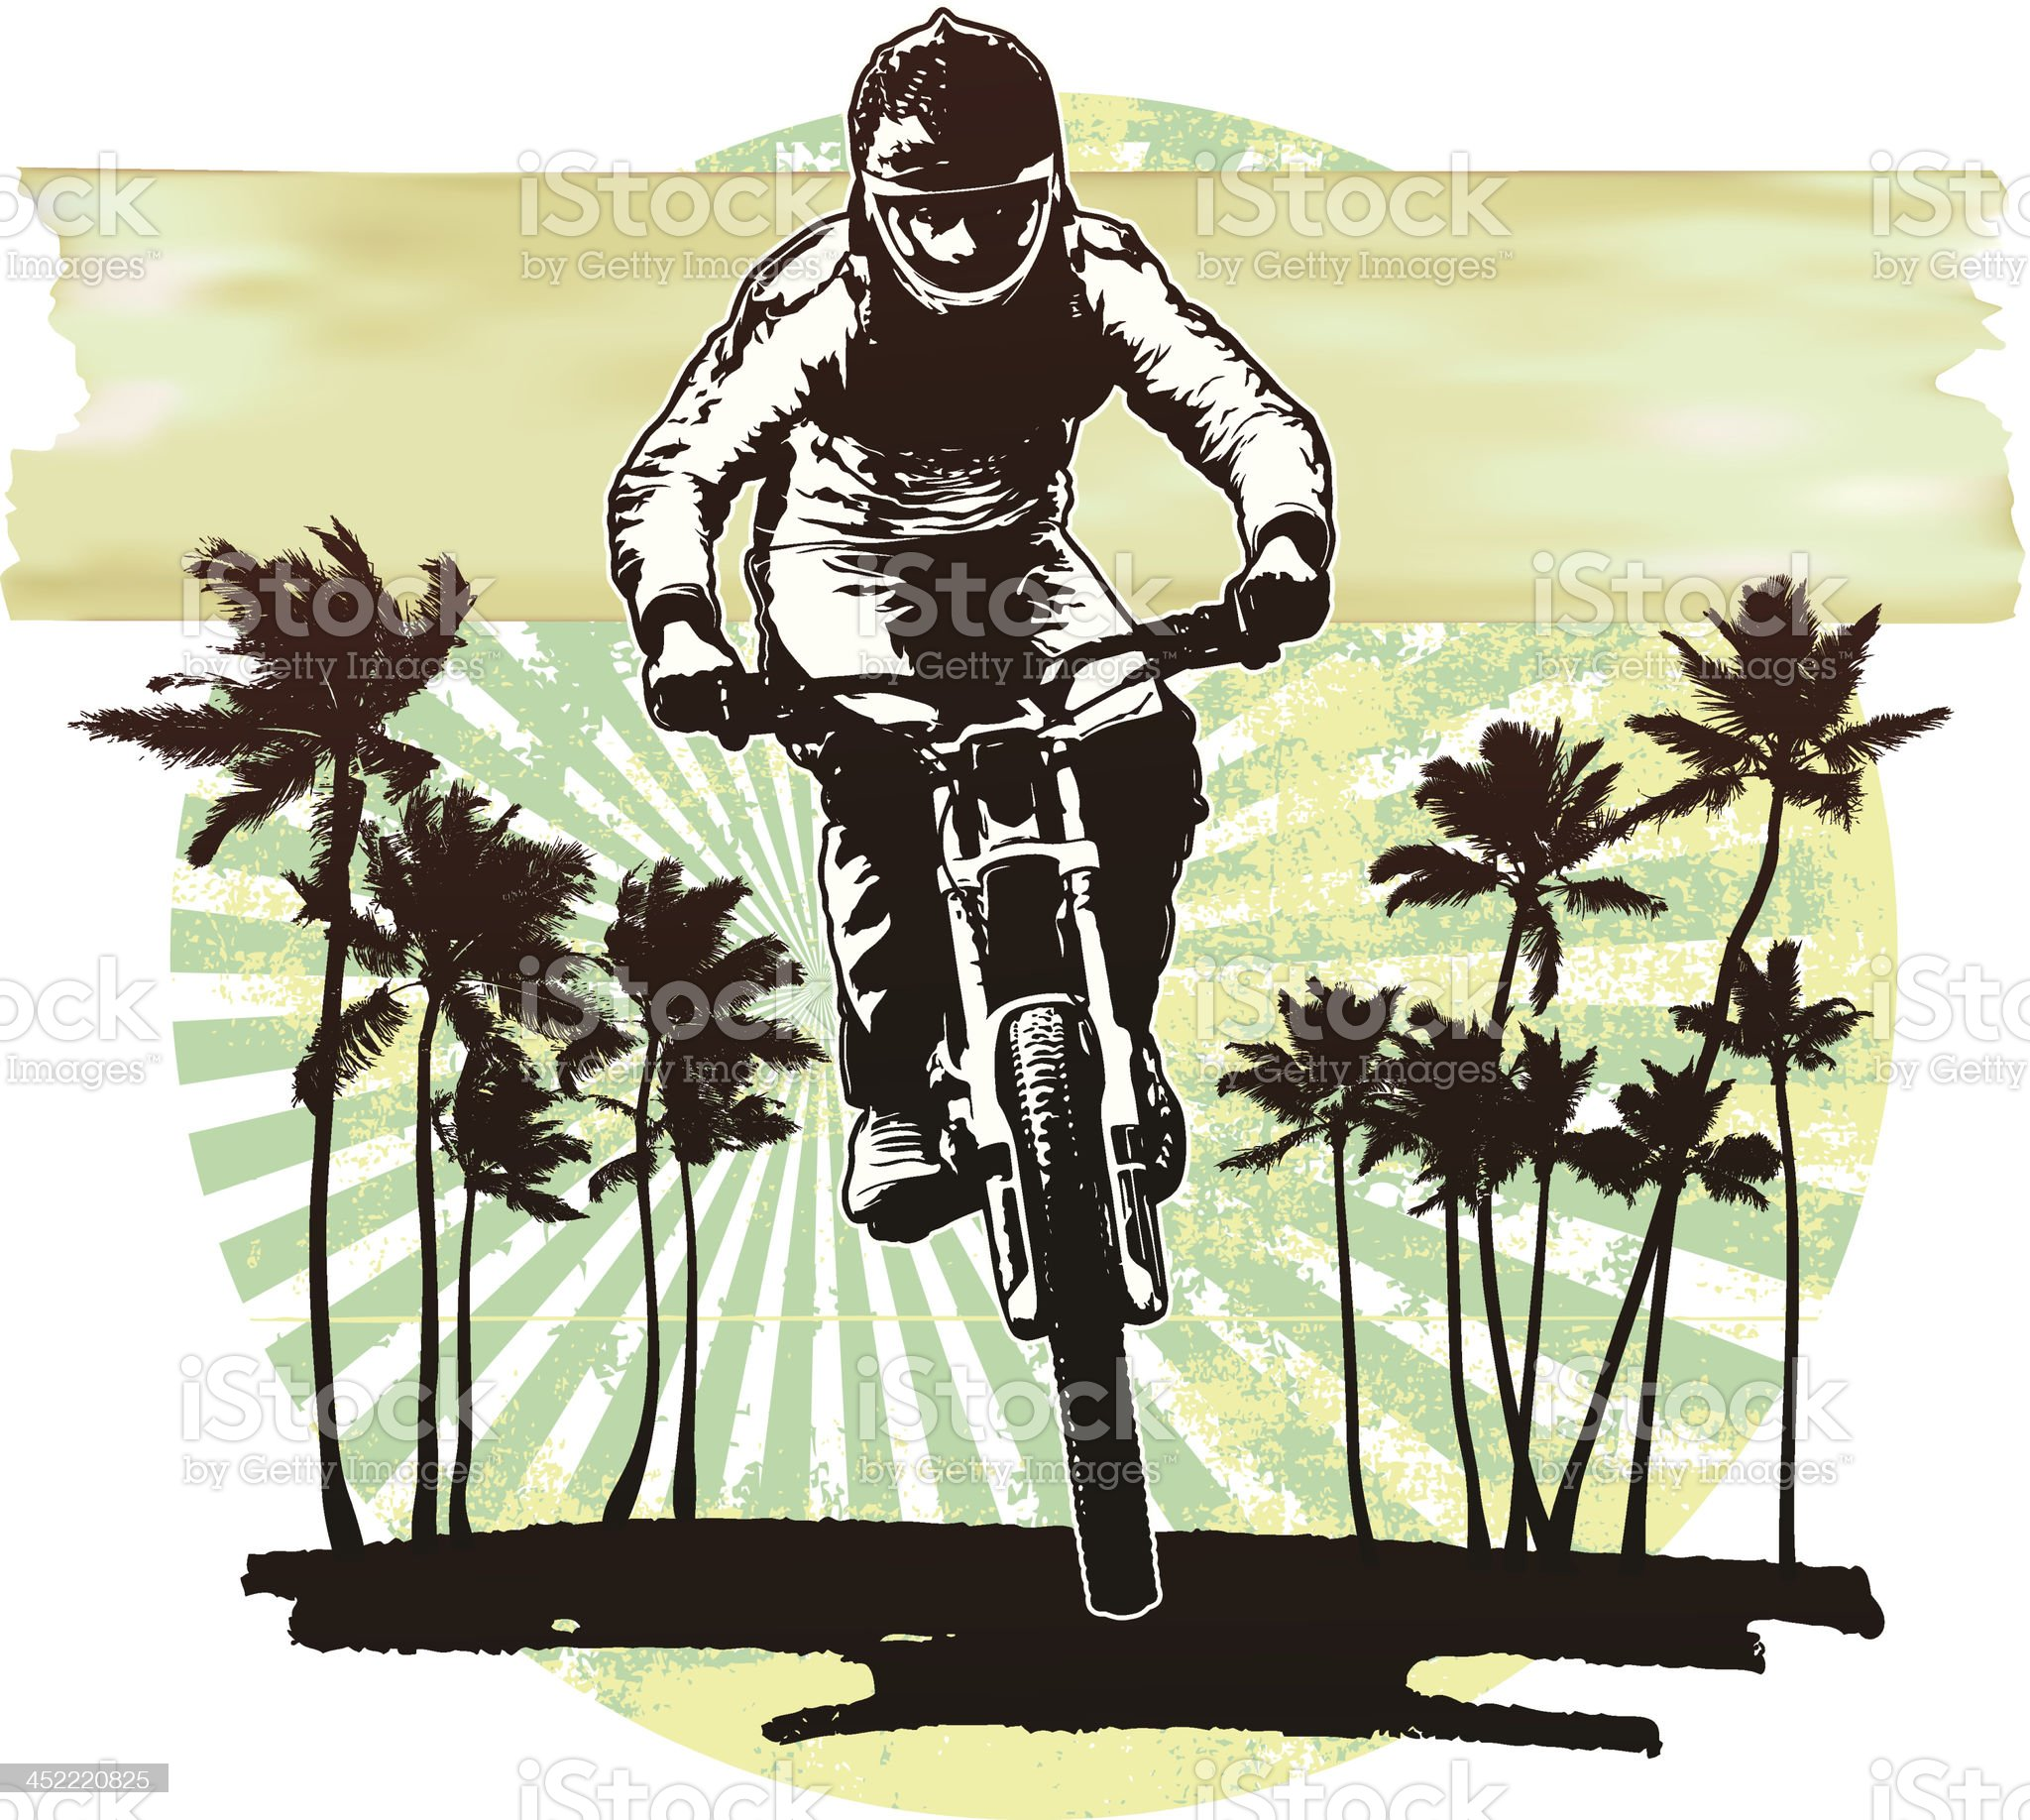 bike rider with grunge summer background royalty-free stock vector art